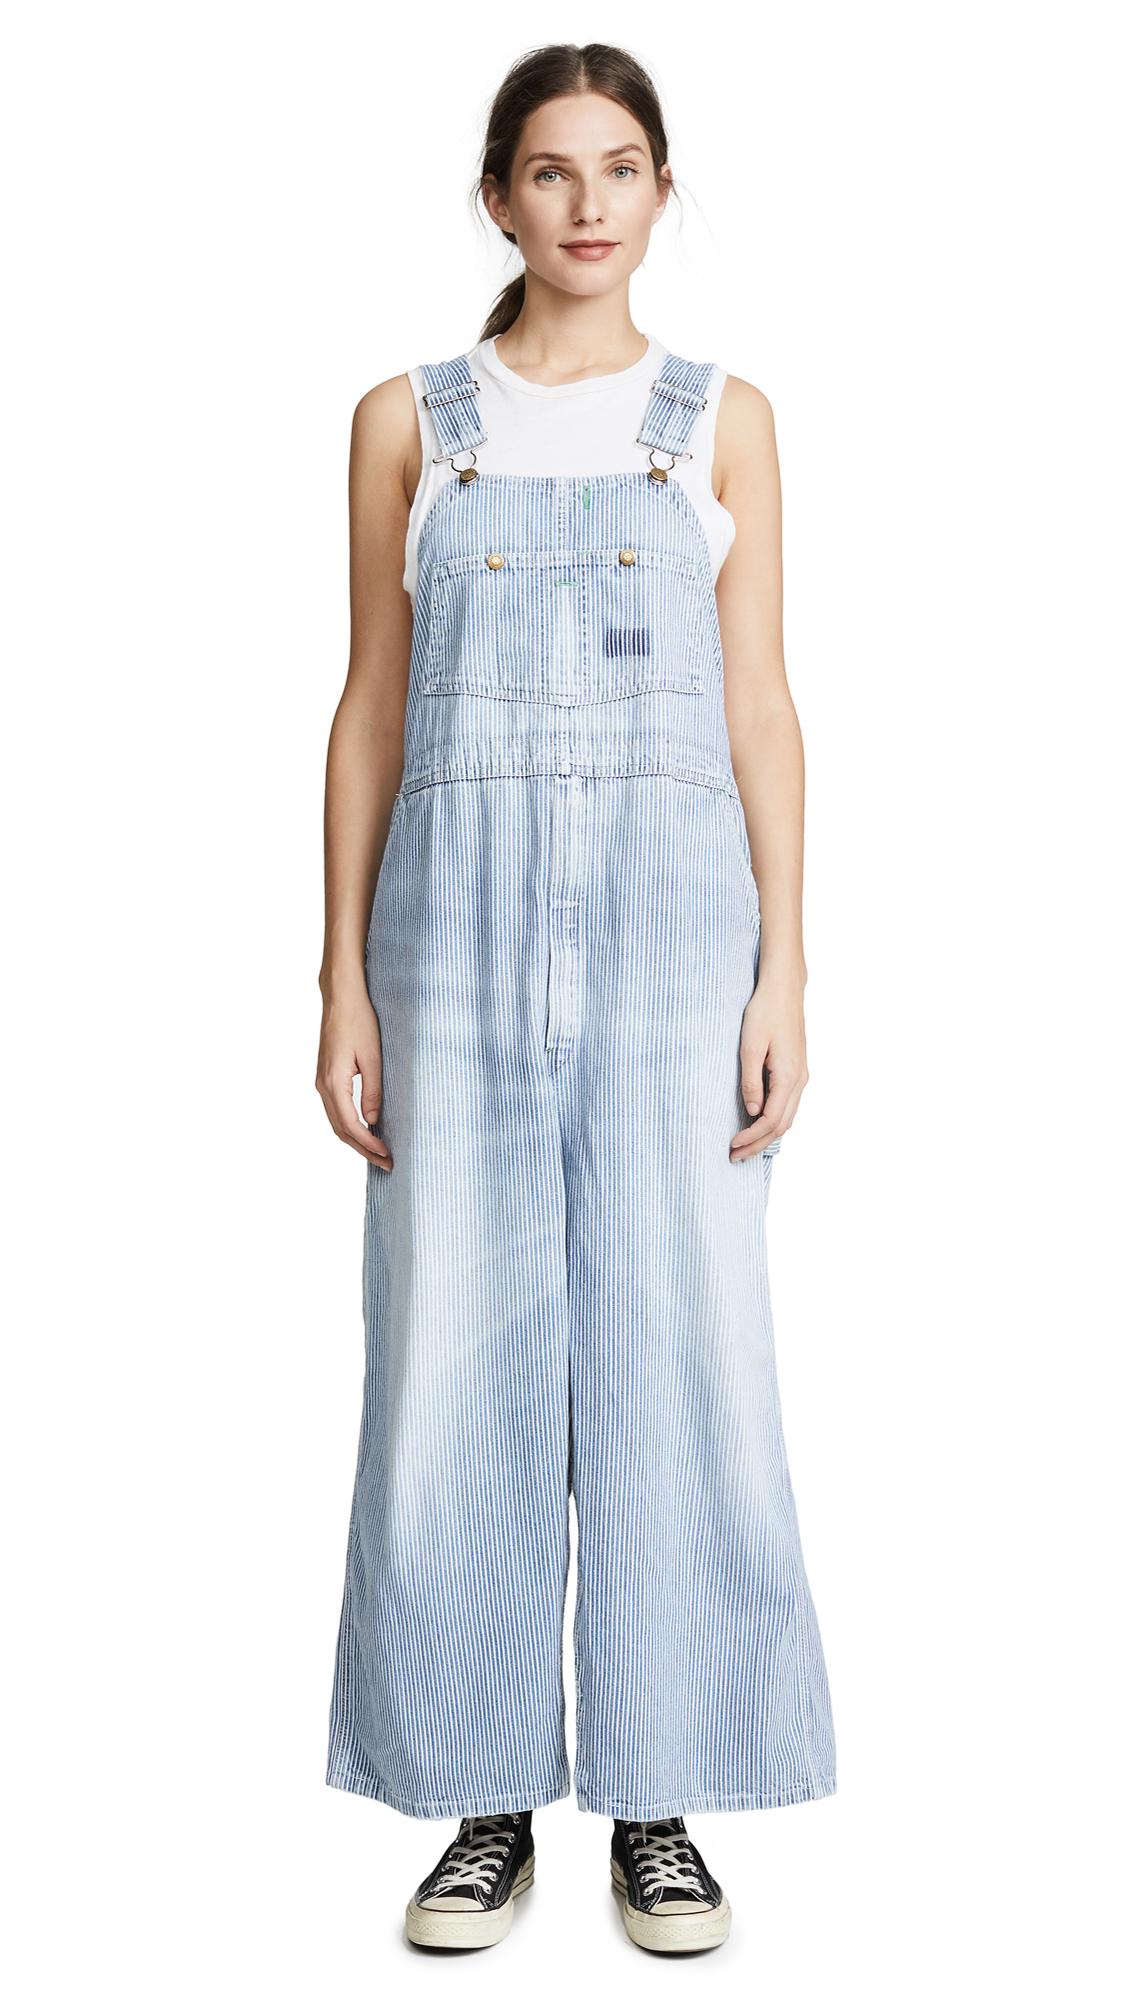 dec468c0d1 R13 Refurbished Railroad Stripe Overall Dress In Vintage Indigo ...